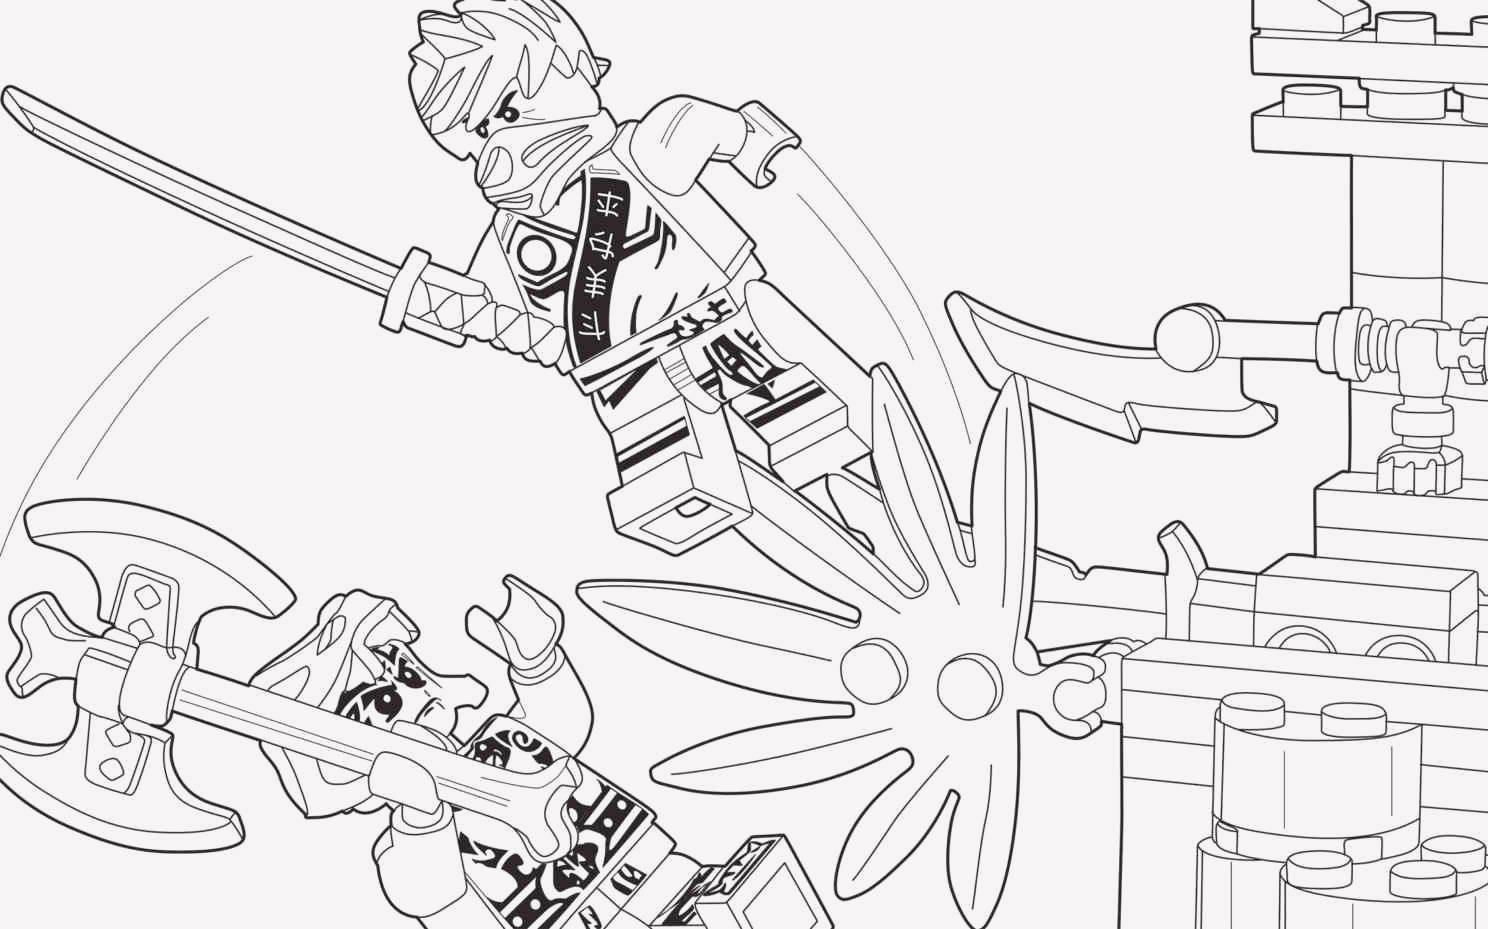 Ausmalbilder Ninjago Nya Einzigartig 25 Genial Malvorlagen Ninjago Nya Sammlung